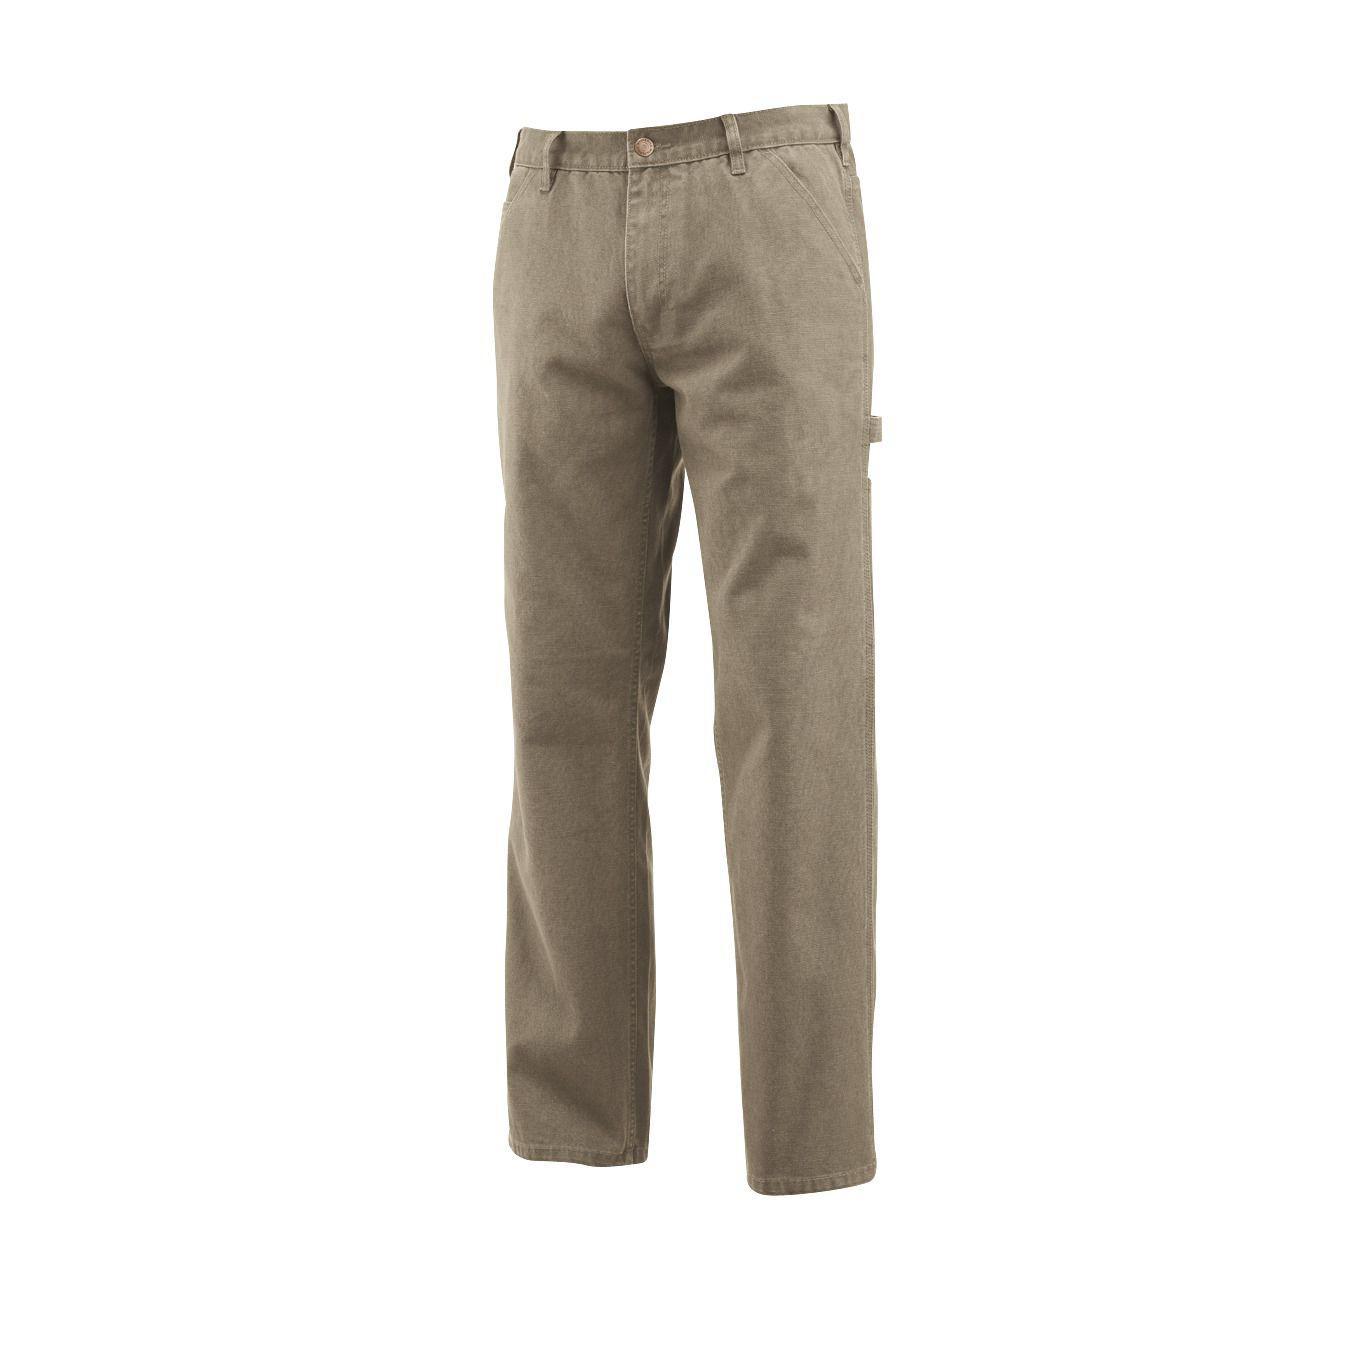 a201e21b98b2f Lyst - Wolverine Hammerloop Carpenter Pants in Natural for Men